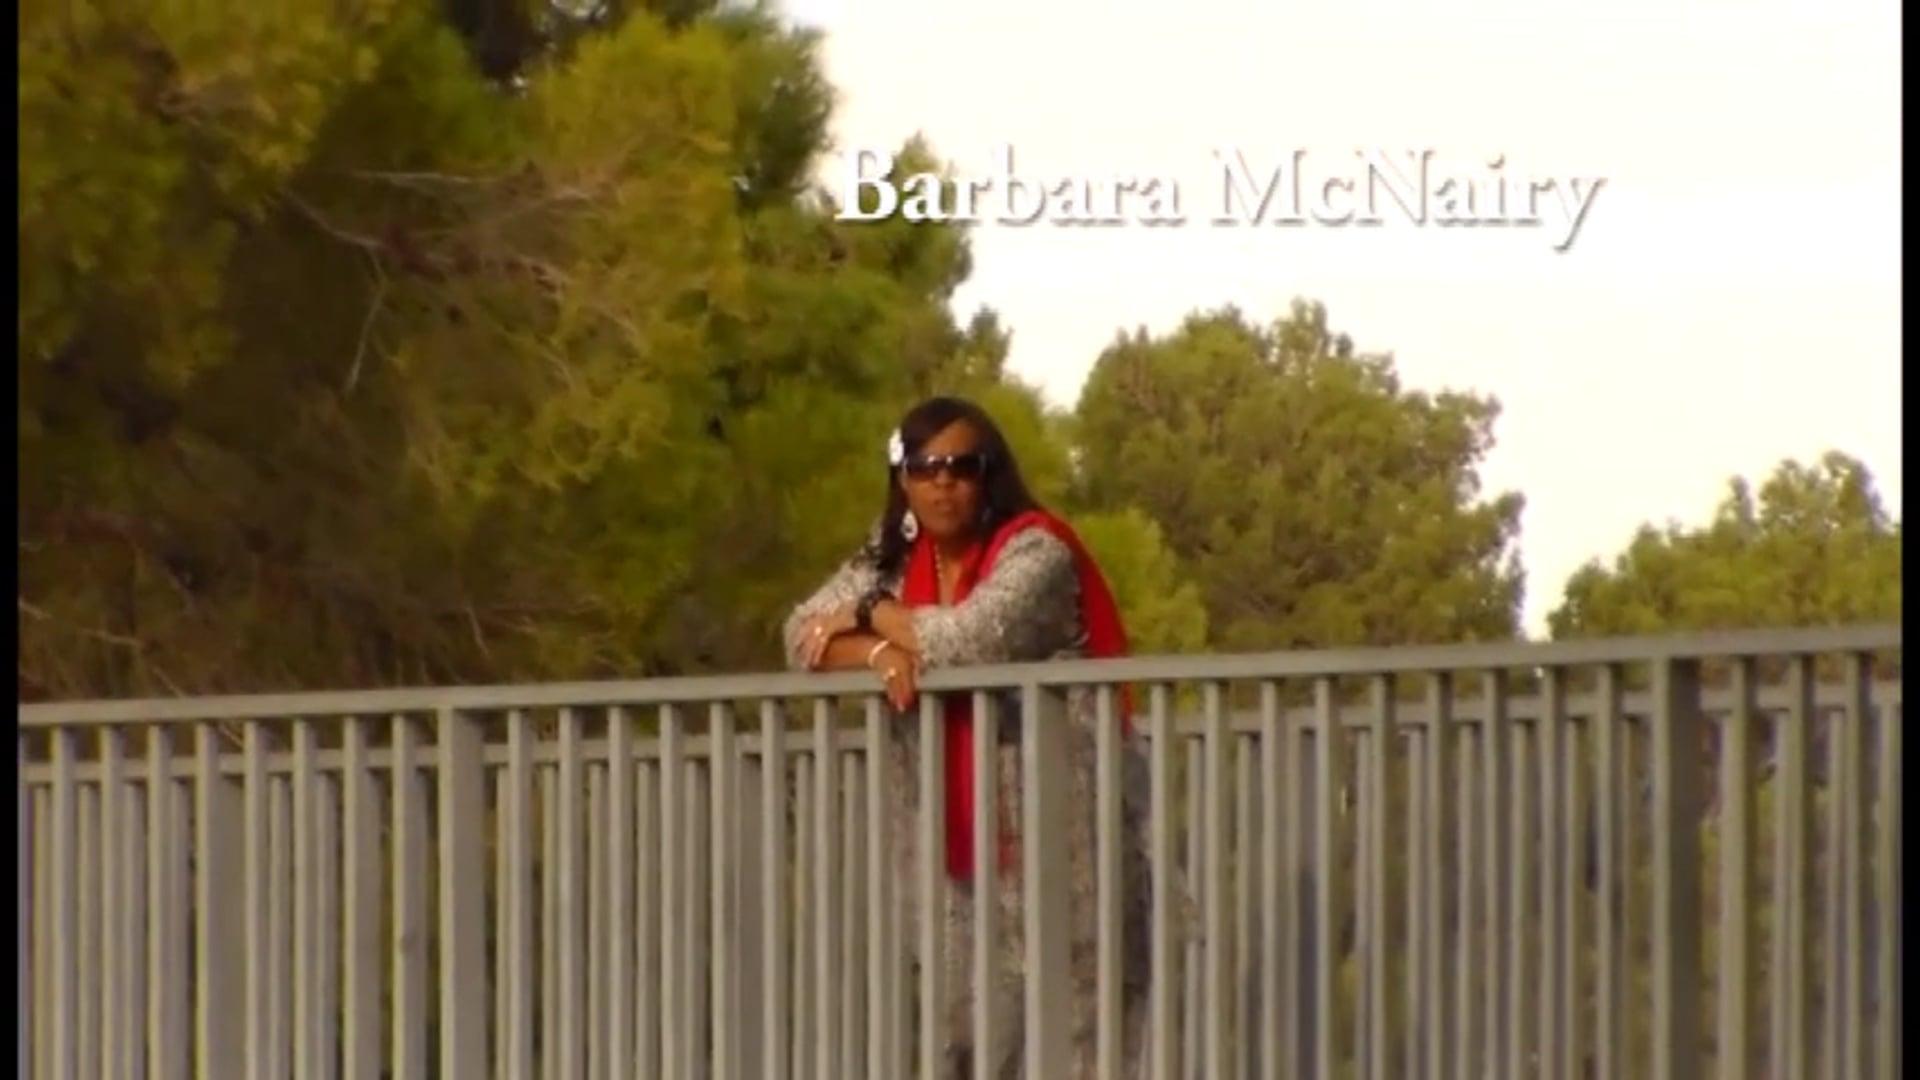 Barbara McNairy - He Showed Up!